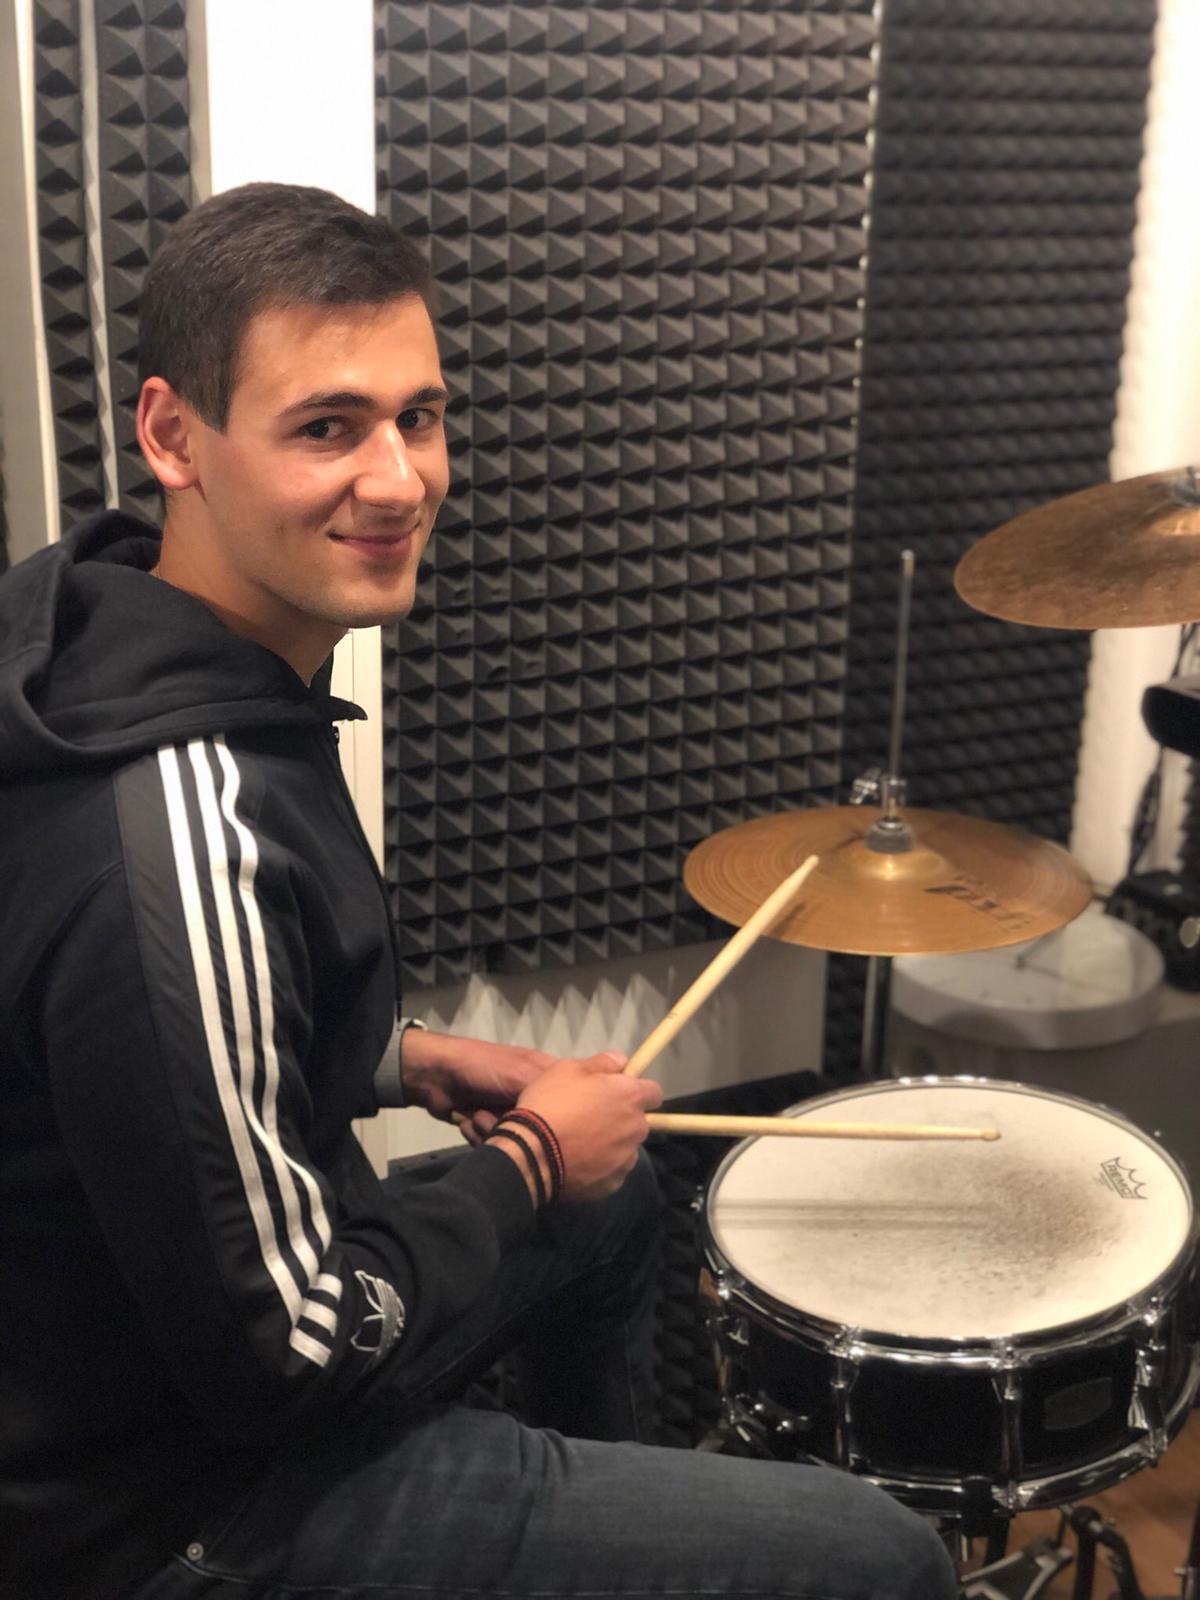 GENIMA_Chris_Drums